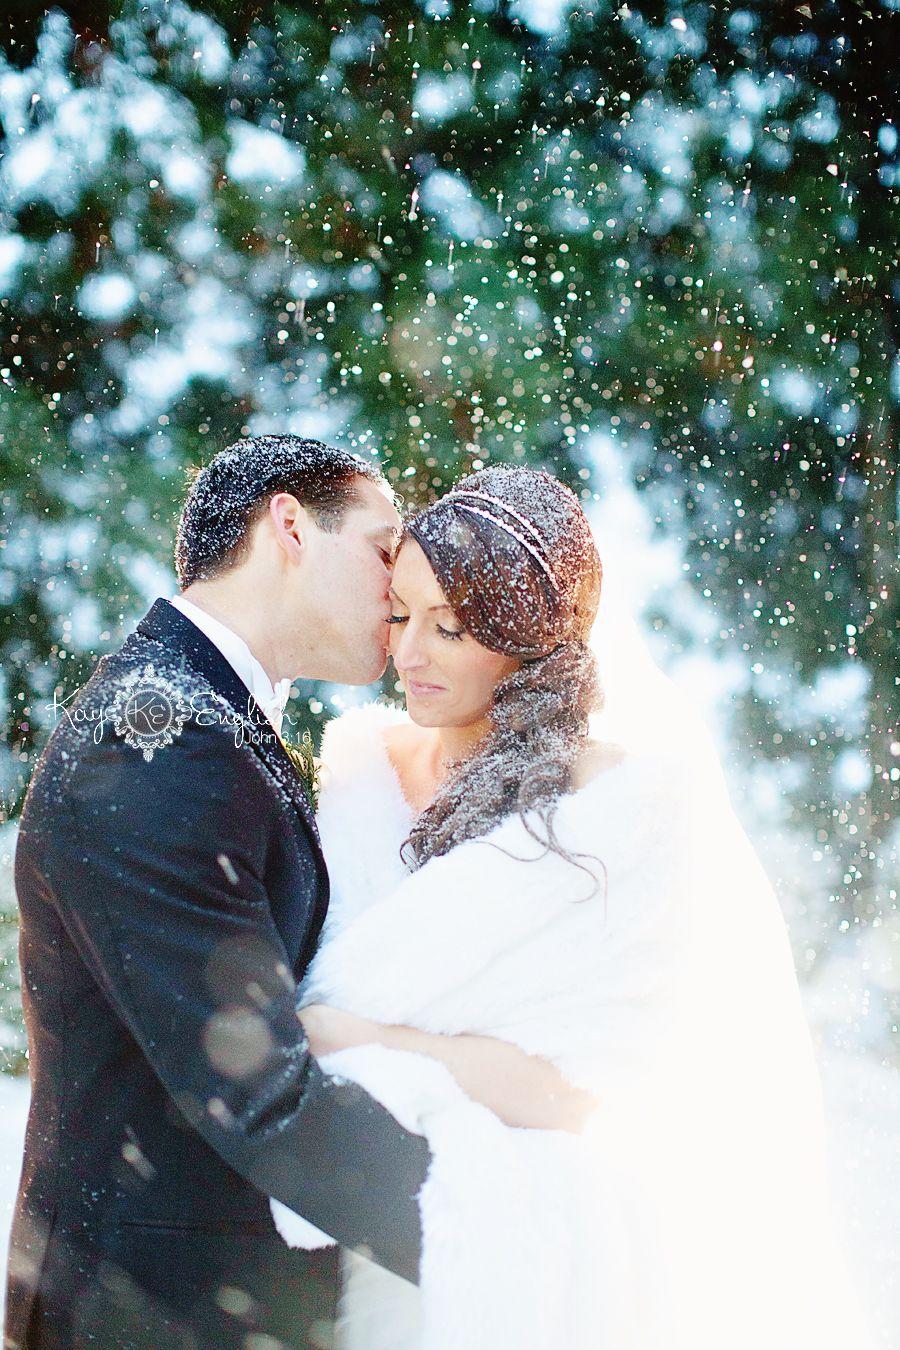 winter wedding photos backlit - Google Search